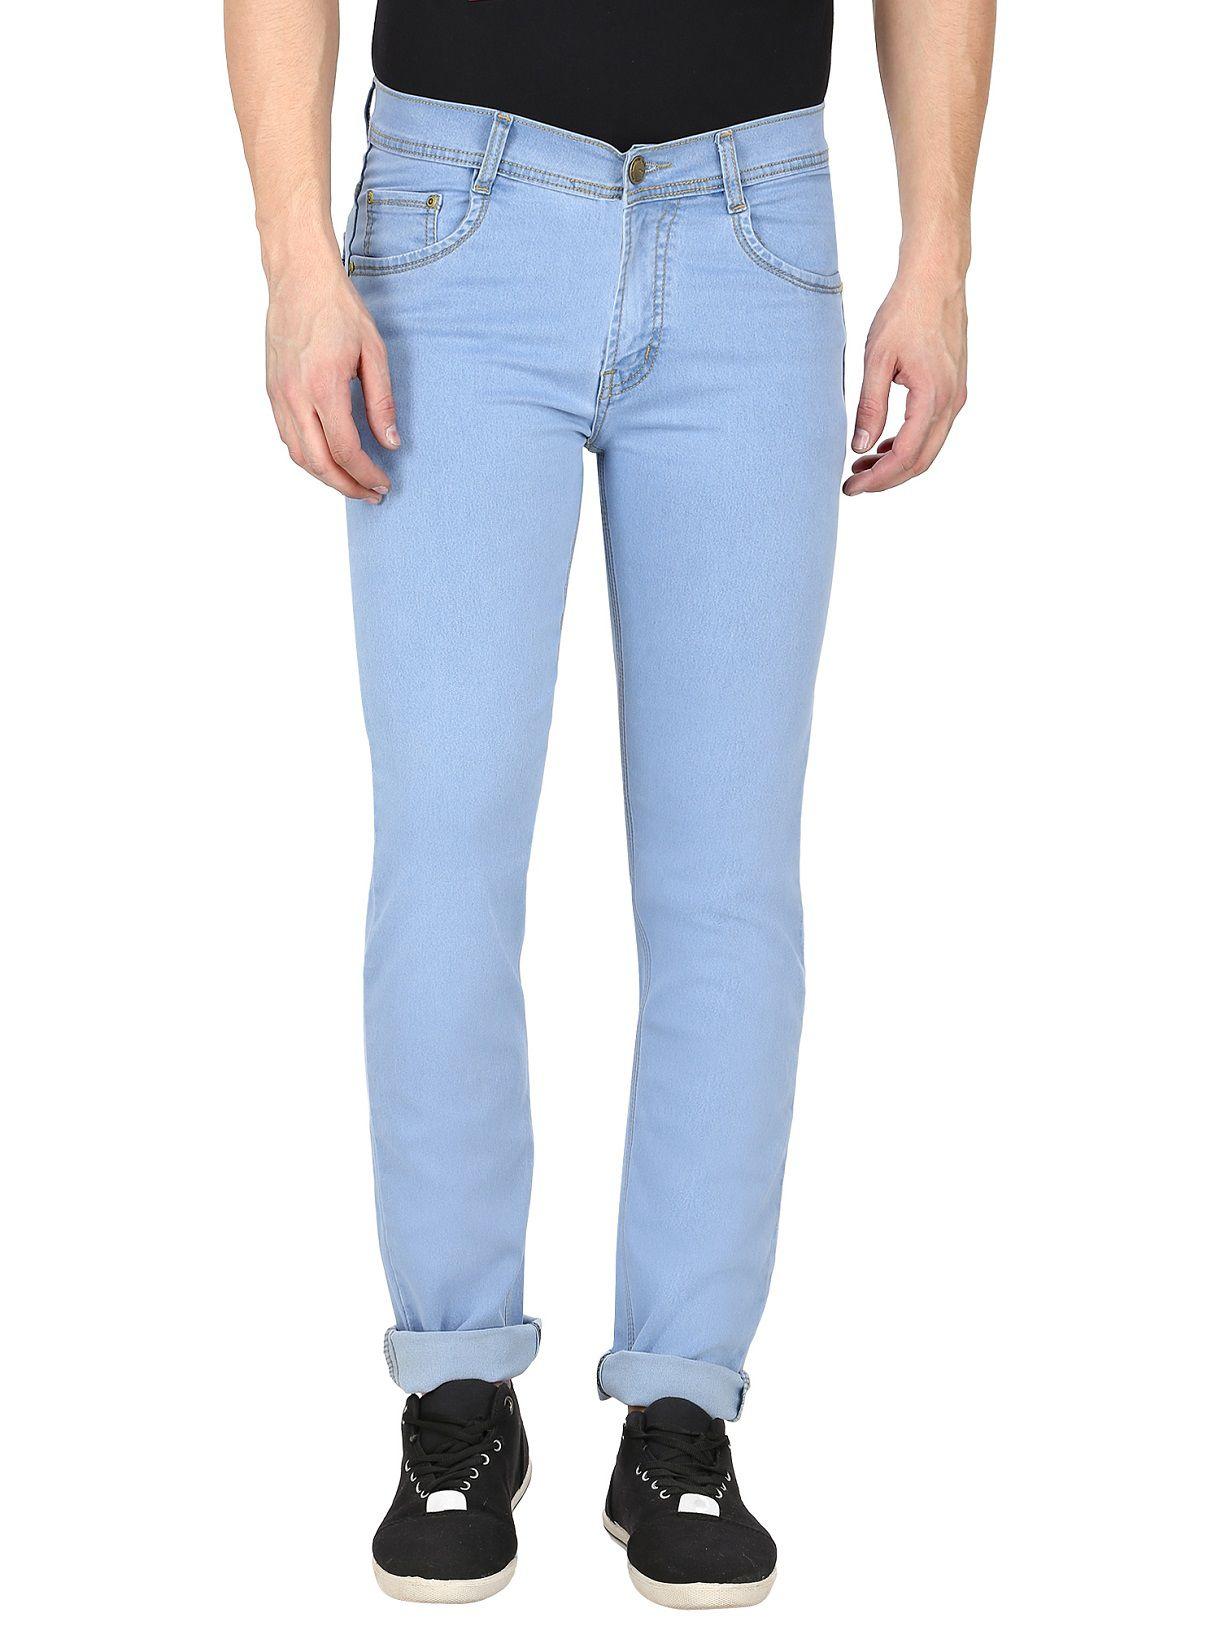 gradely Light Blue Regular Fit Jeans